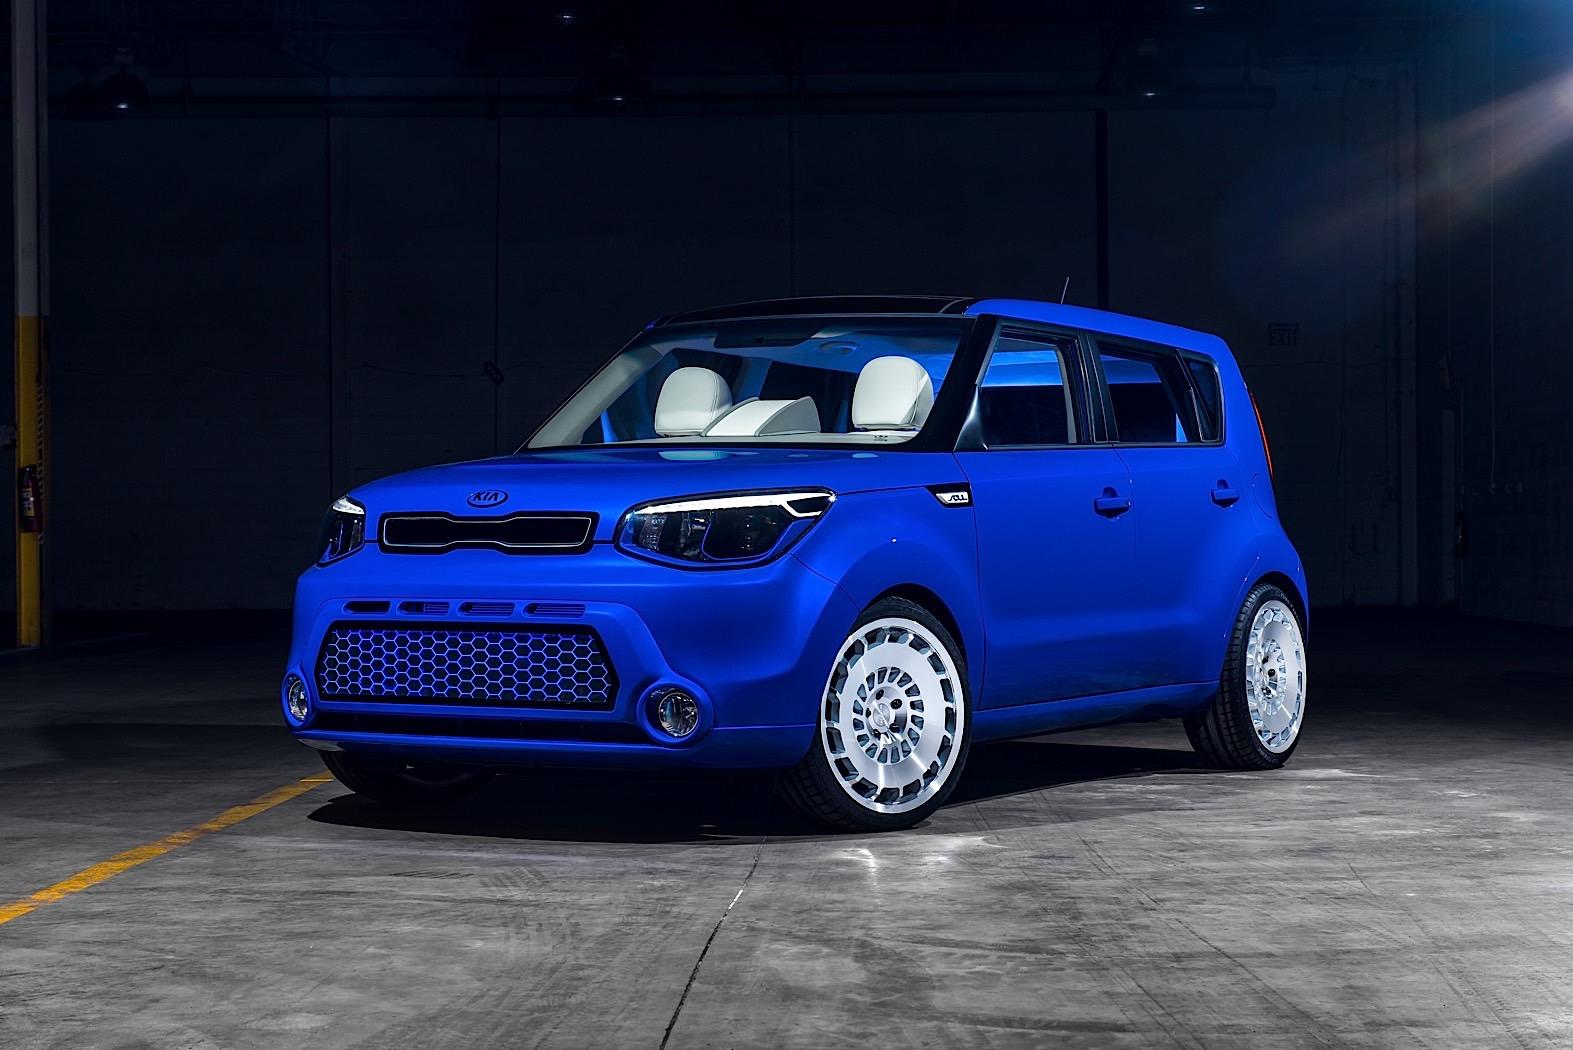 The Kia Soul First Class Concept Is An Autonomous Two